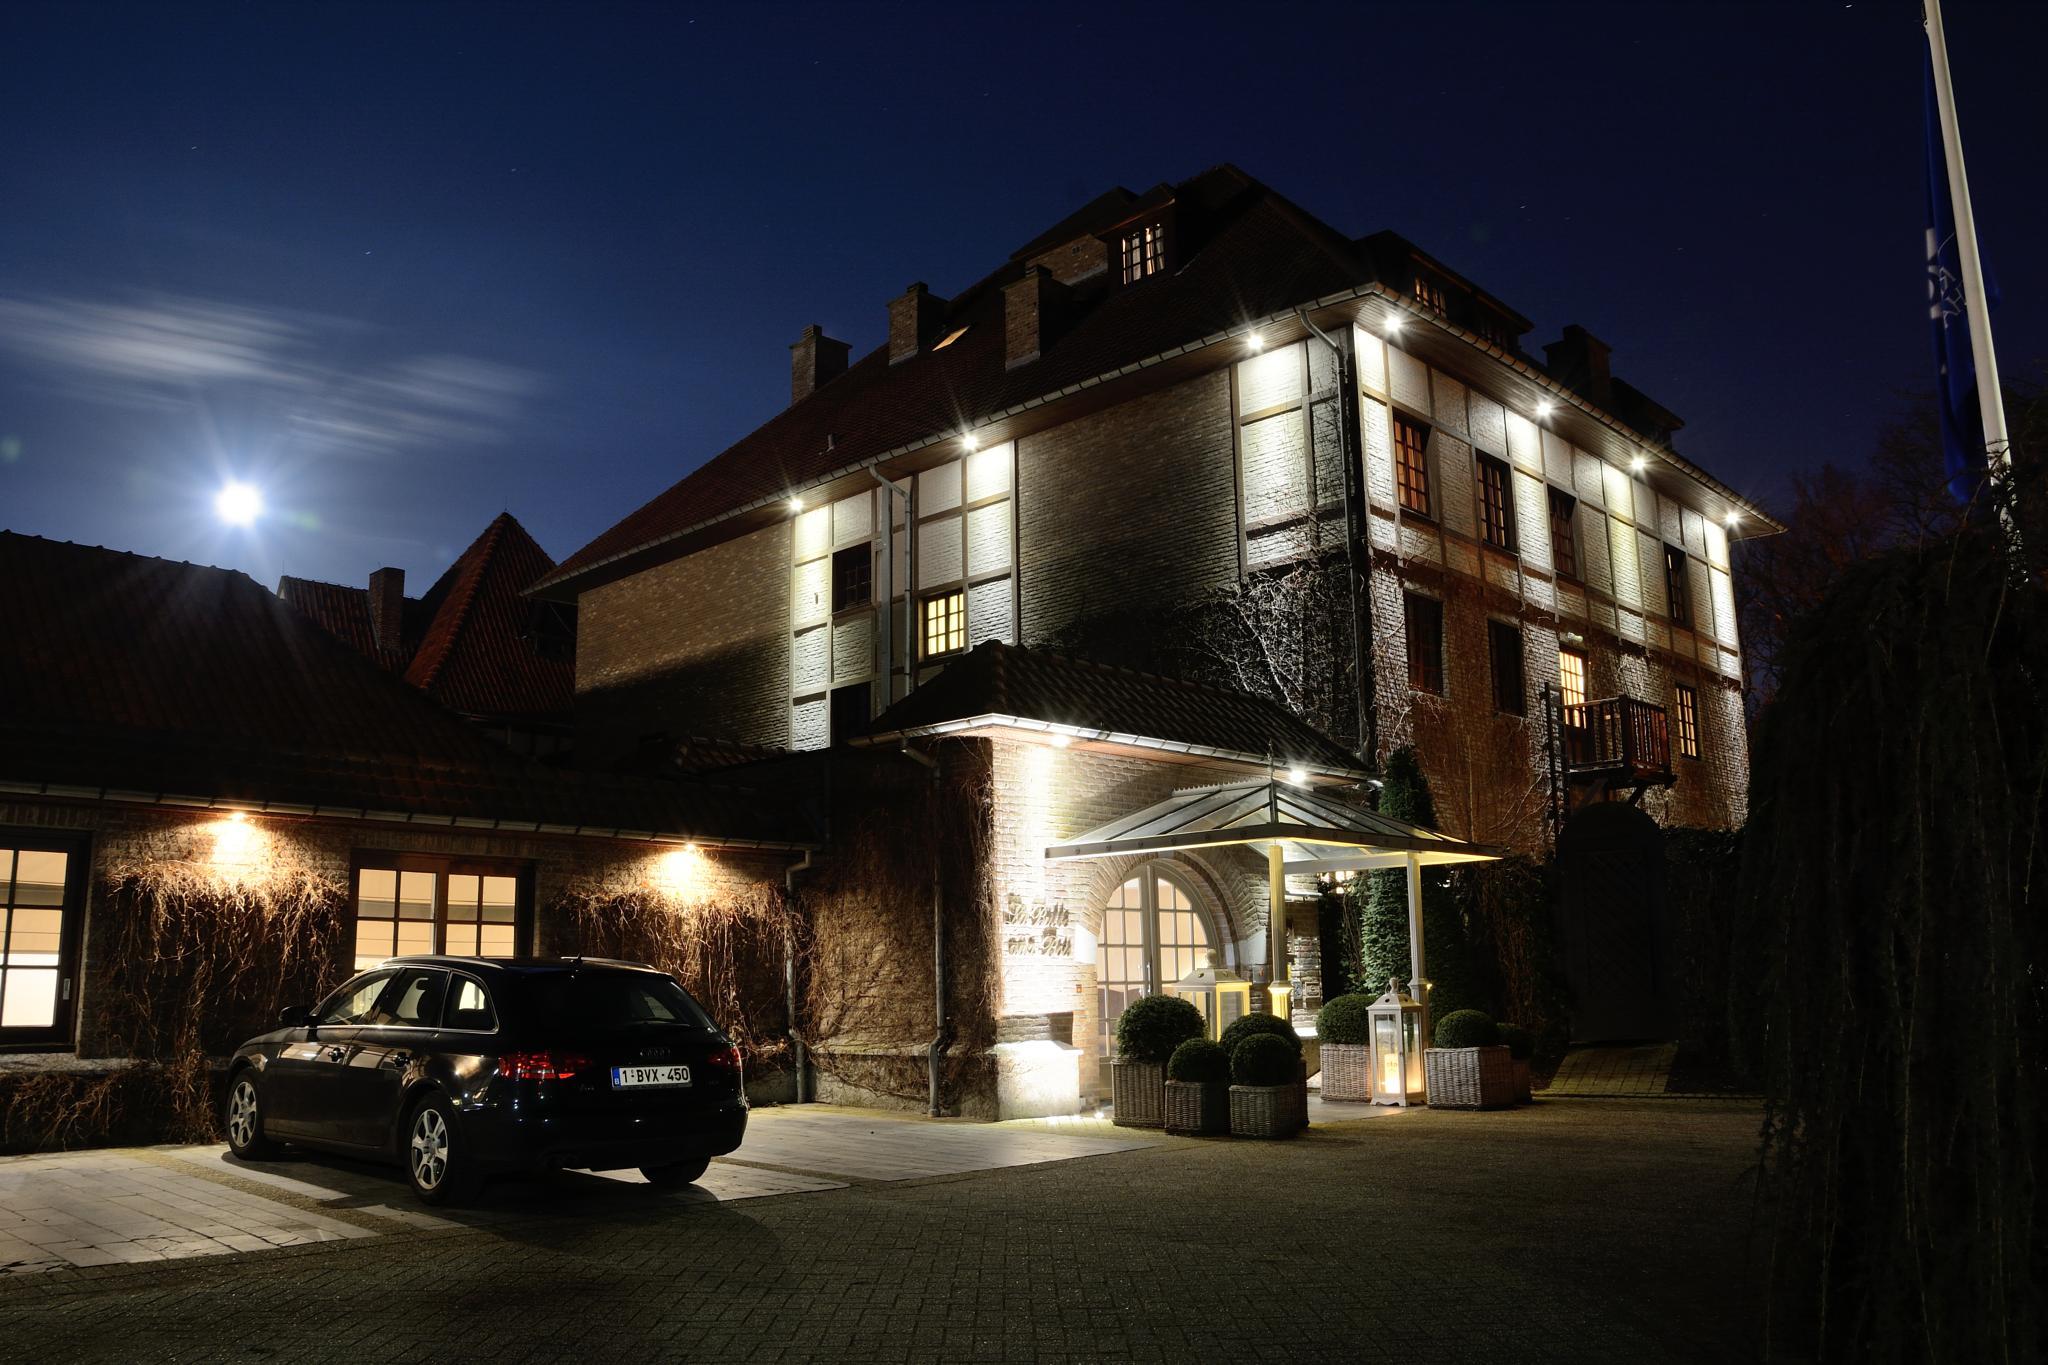 """La butte aux bois"" hotel Neerharen, Belgium by Wim Byl"